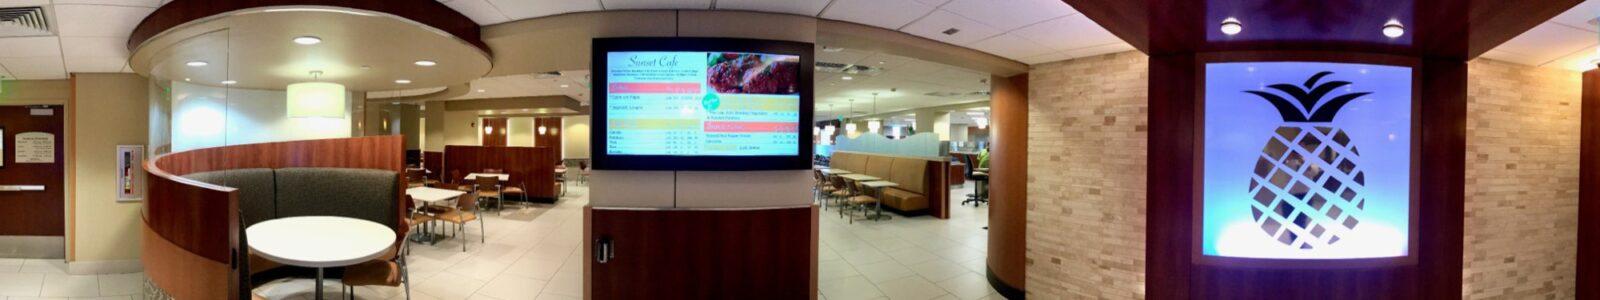 restaurants-row-bg-1